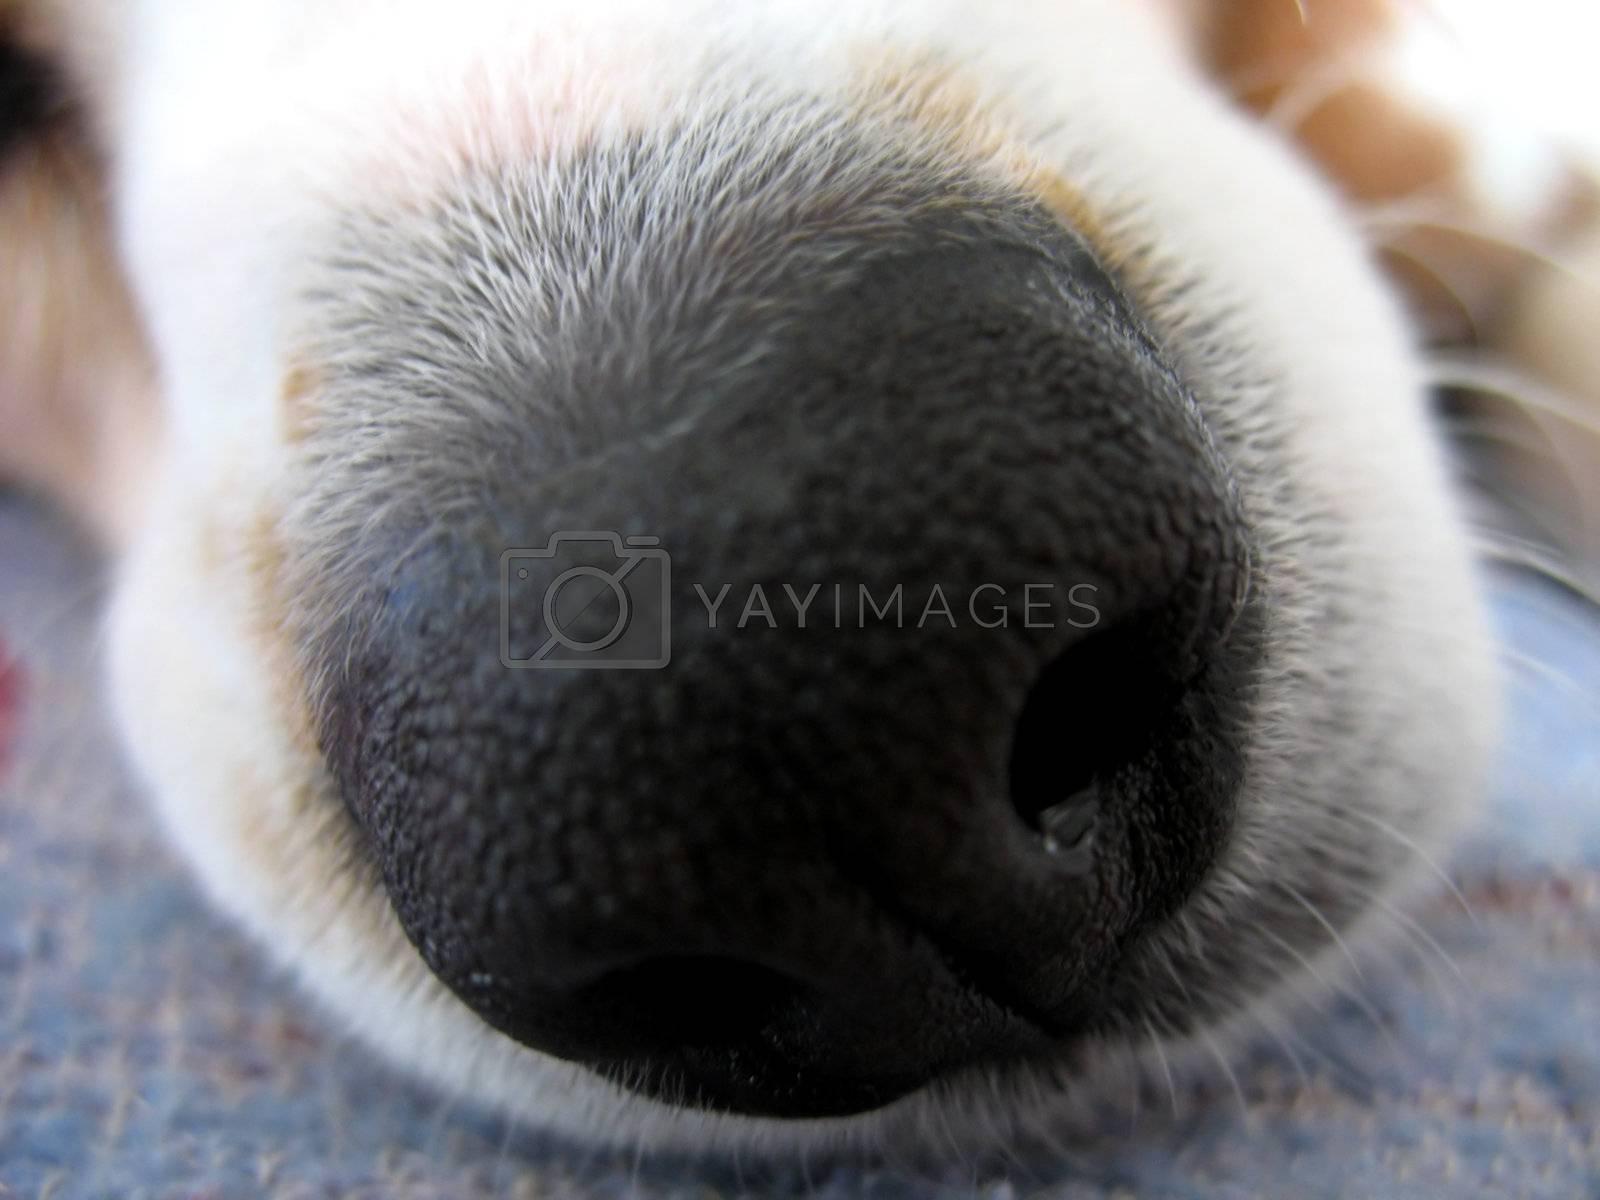 A macro shot of a beagle dog's nose.